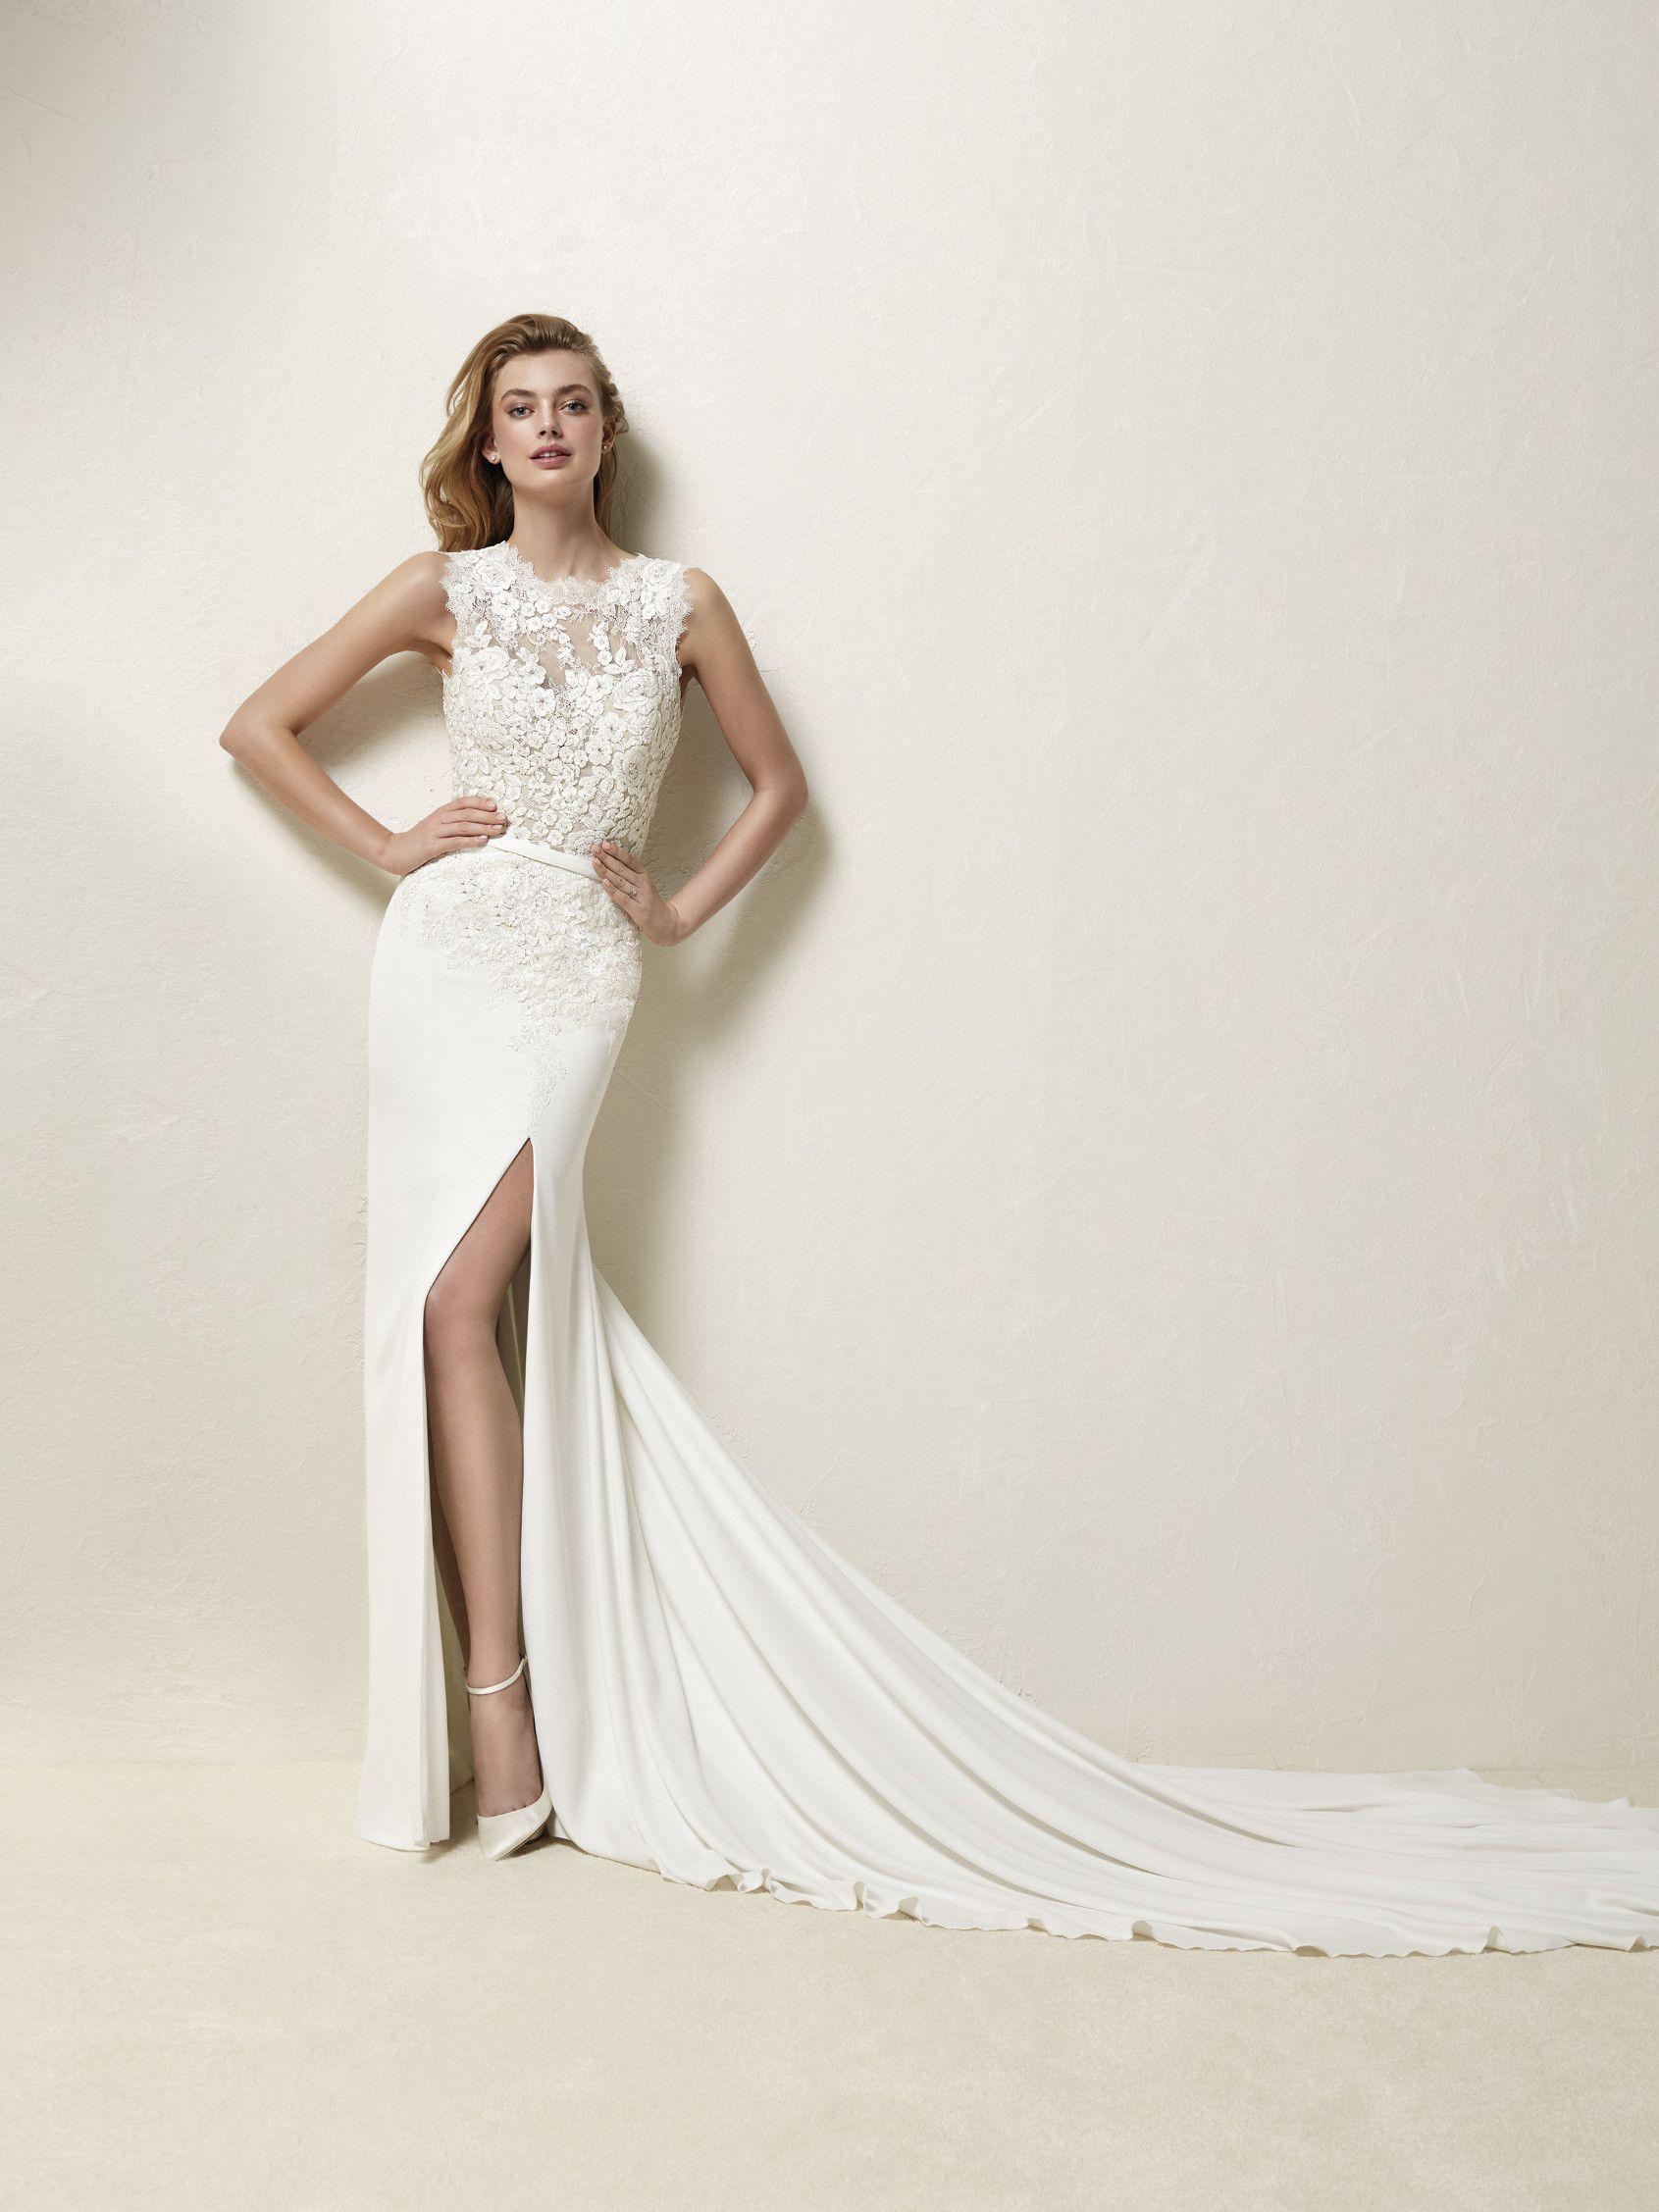 Styles of wedding dresses  Vestido de noiva chantilly  Drenia   Wedding Ideas  Pinterest